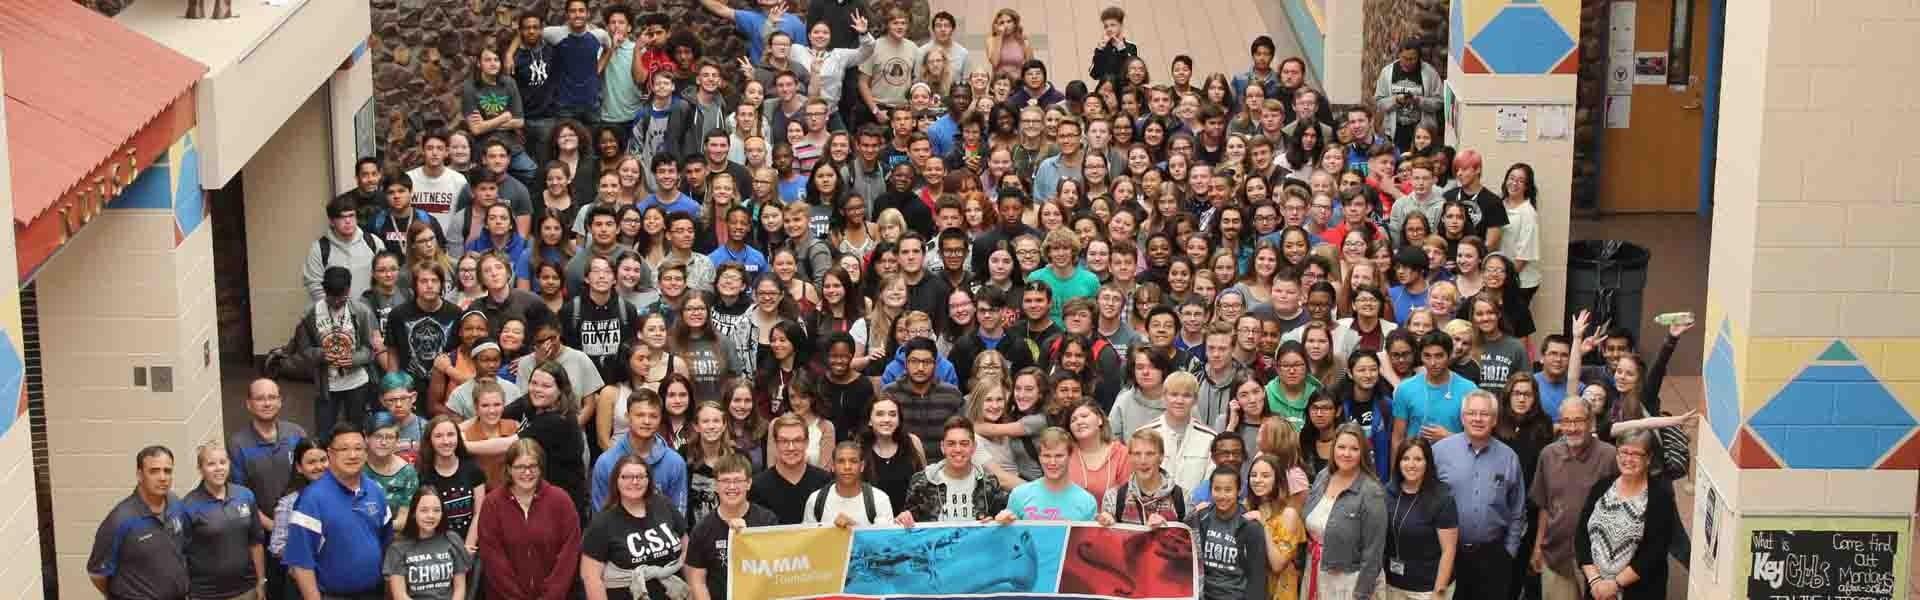 Sierravista-Highschool-AZ-BAnd-Main-Banner-US-2019